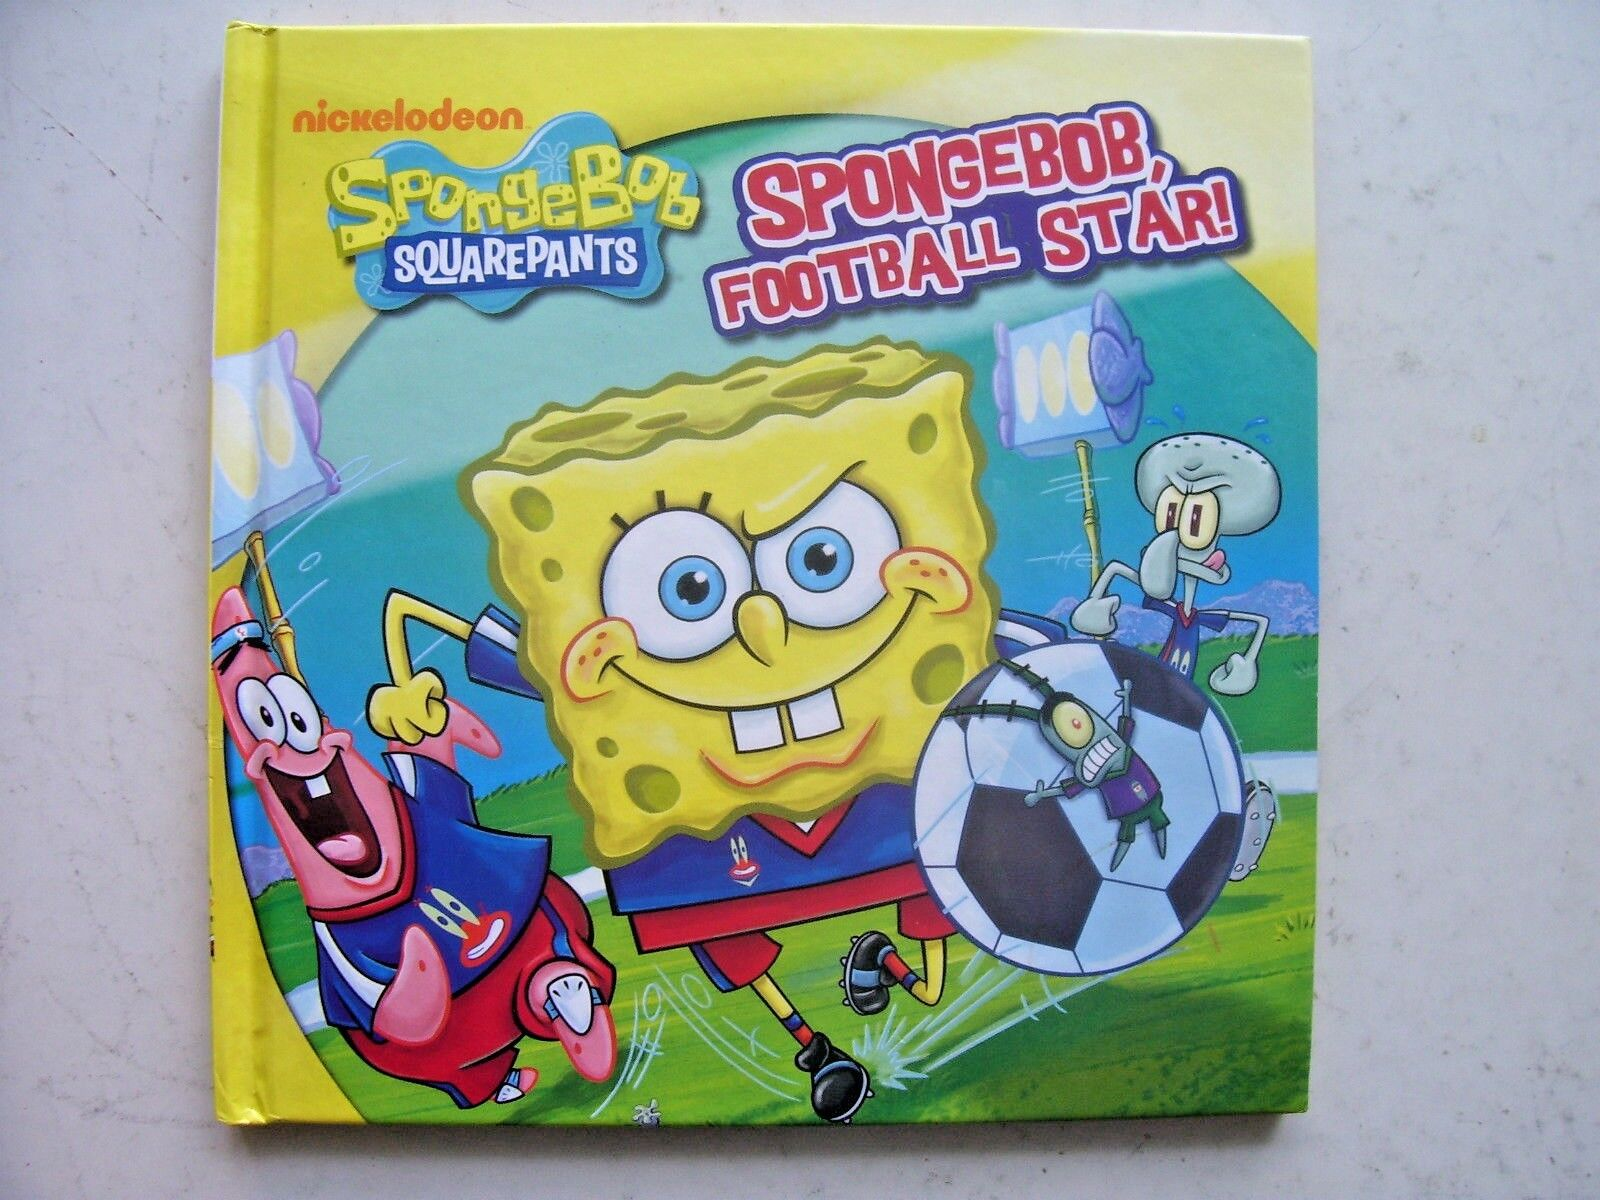 SpongeBob SquarePants, SpongeBob Football Star! by Parragon (Hardback, 2013)